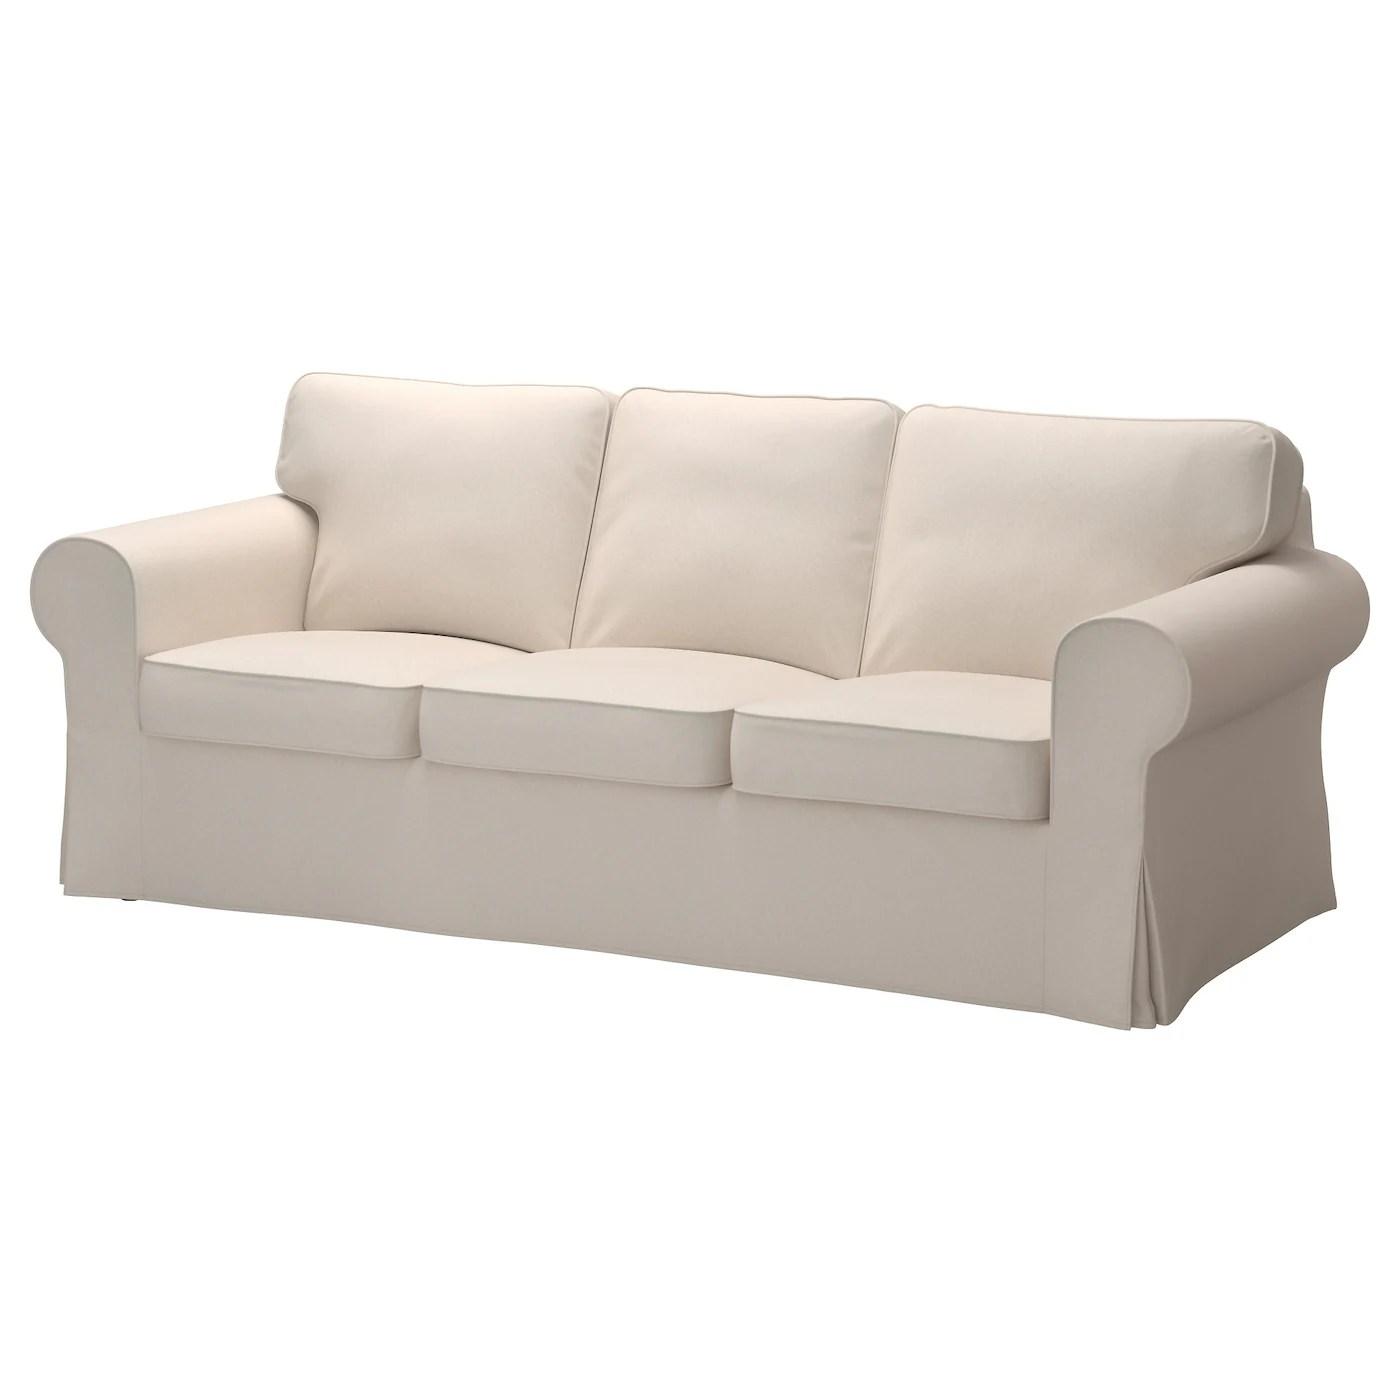 Ektorp Three Seat Sofa Lofallet Beige